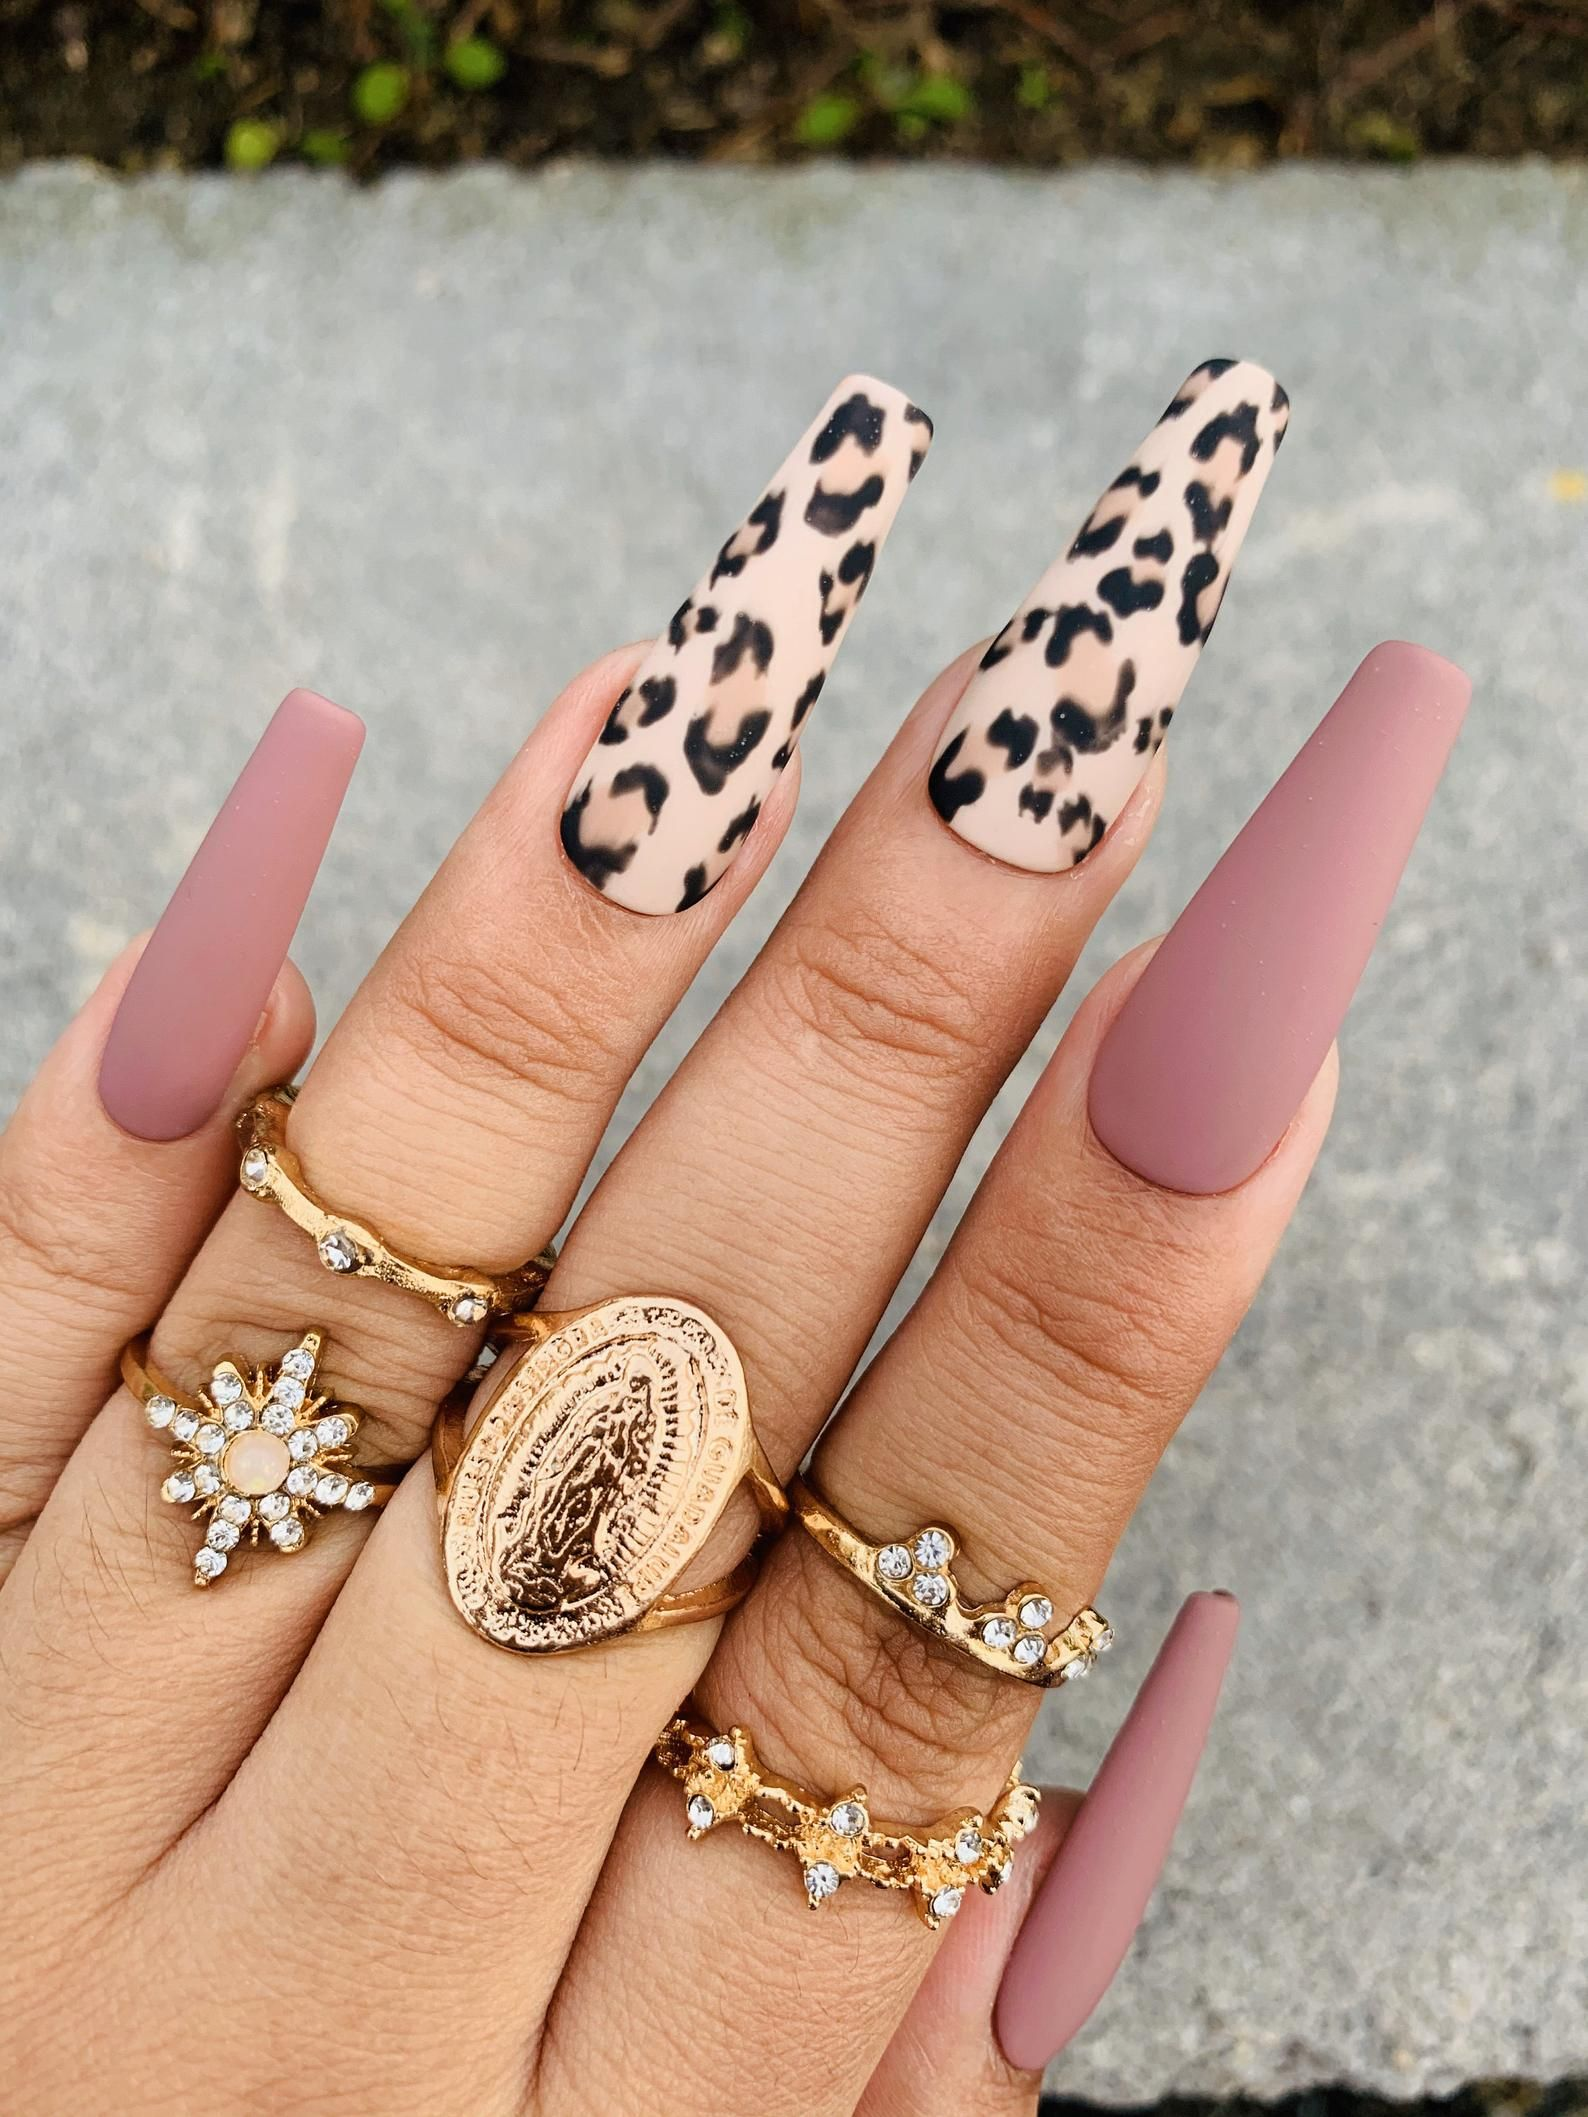 Cheetah Print Press On Nails Mauve Nails Any Shape And Size Fake Nails Matte Coffin Nails In 2020 Mauve Nails Coffin Nails Matte Cheetah Print Nails